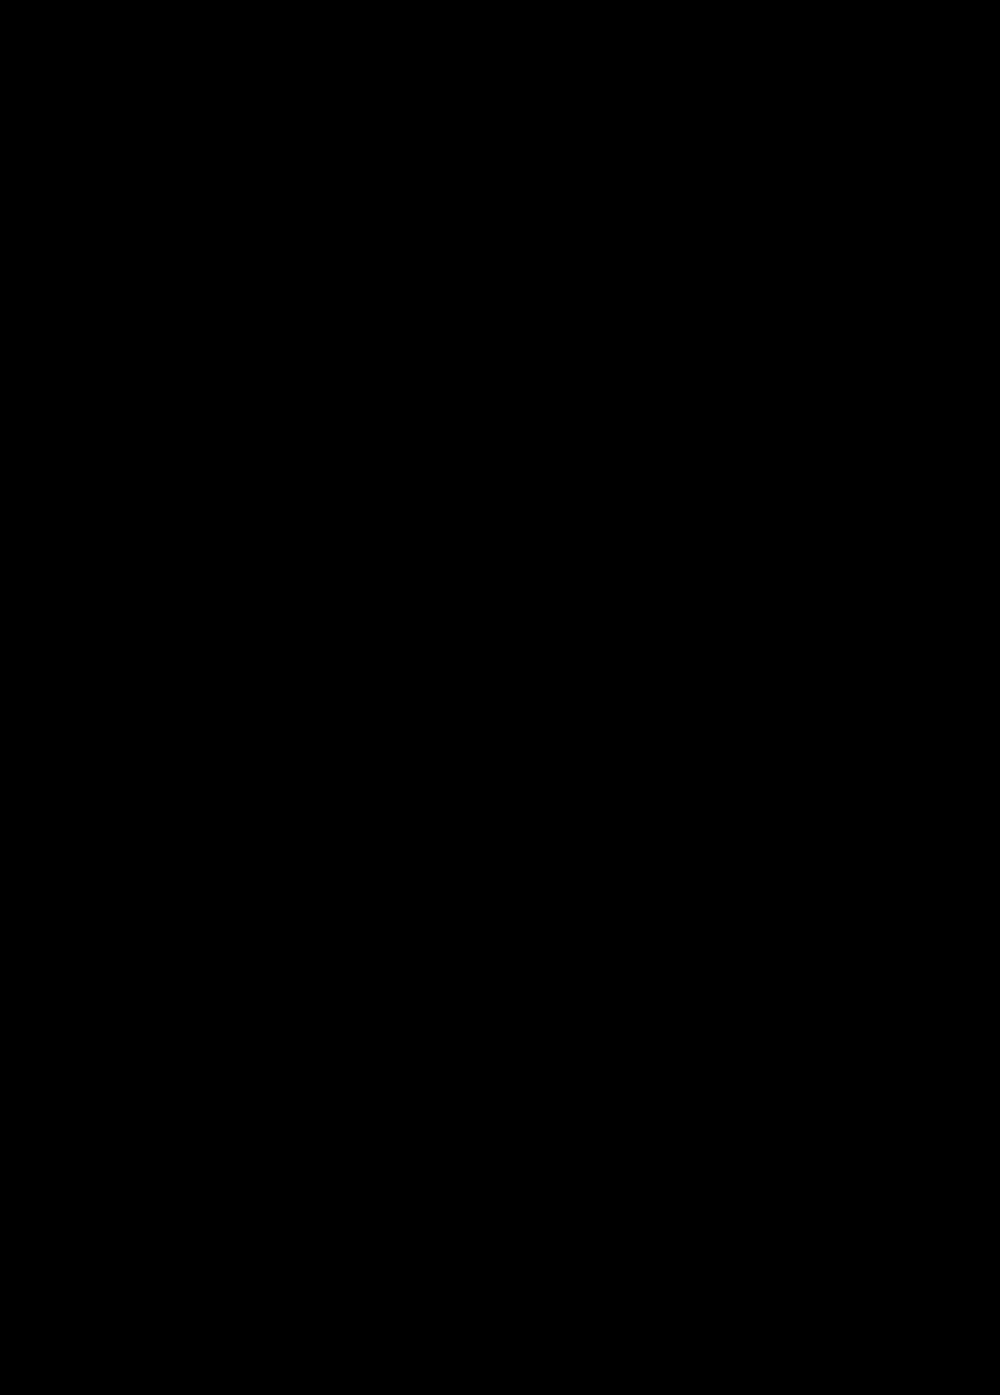 """Baudolino"", Umberto Eco"